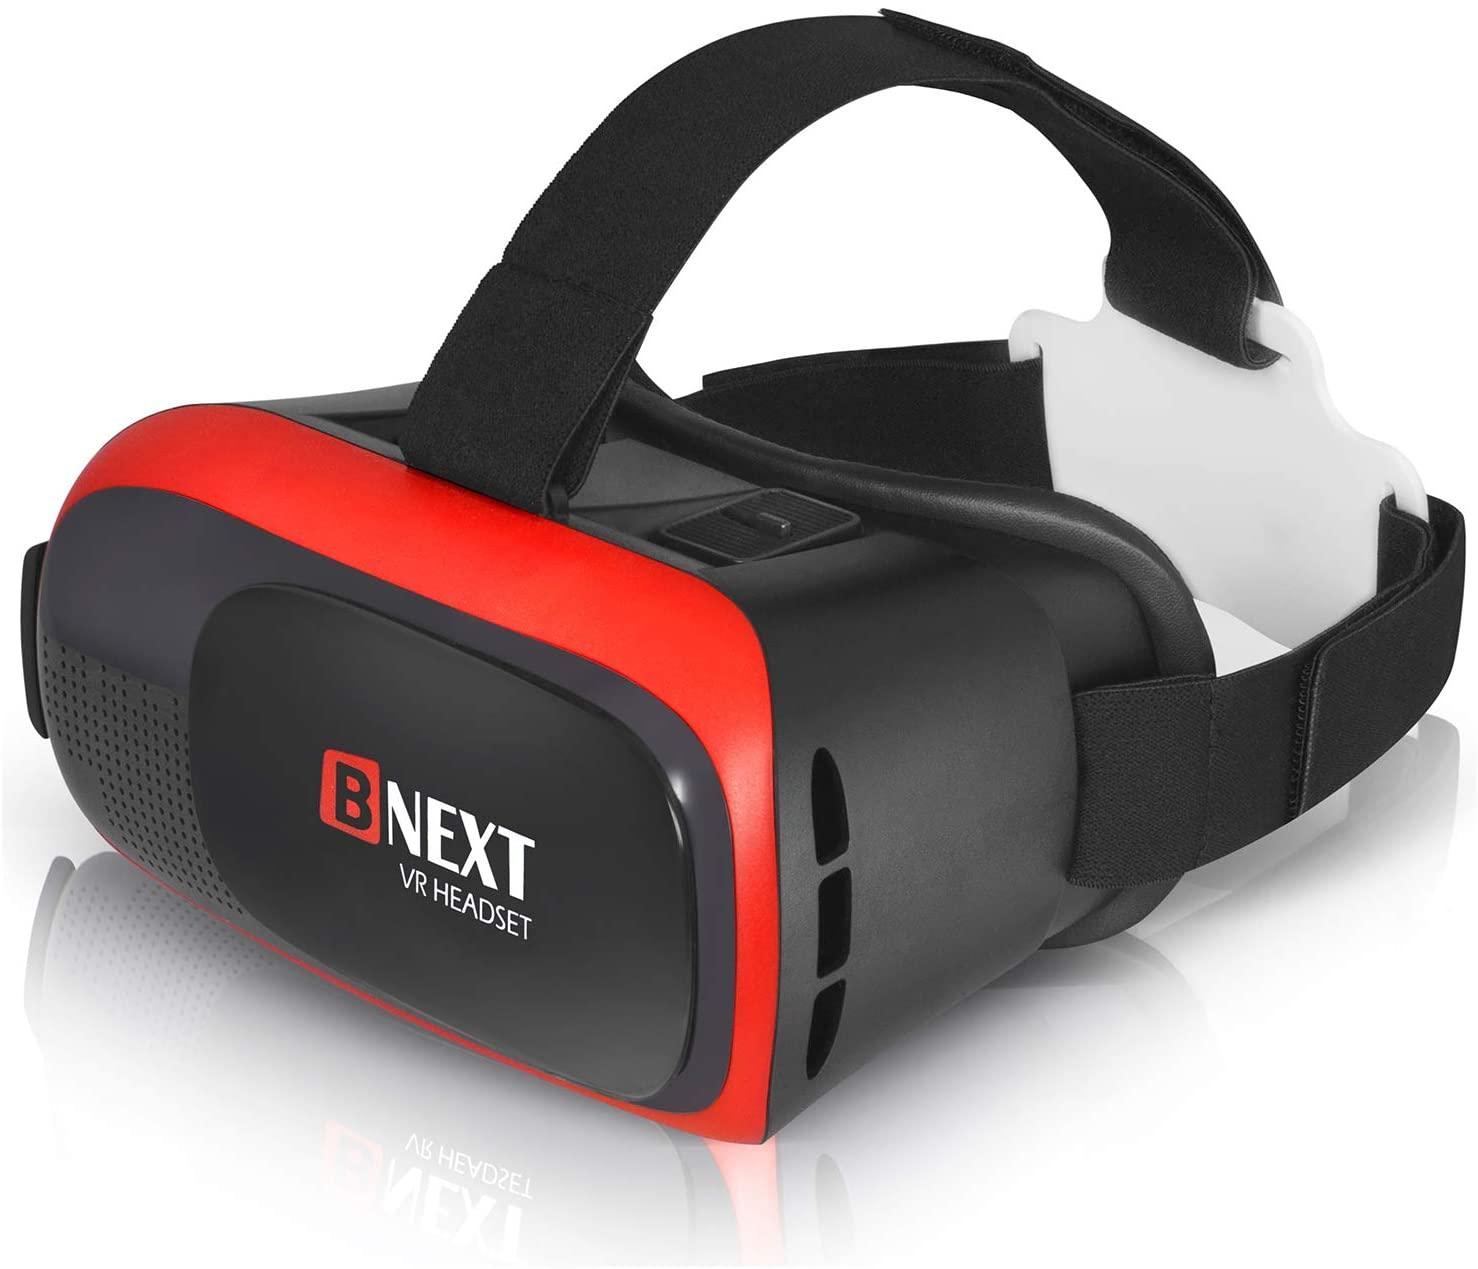 BNext VR Headset